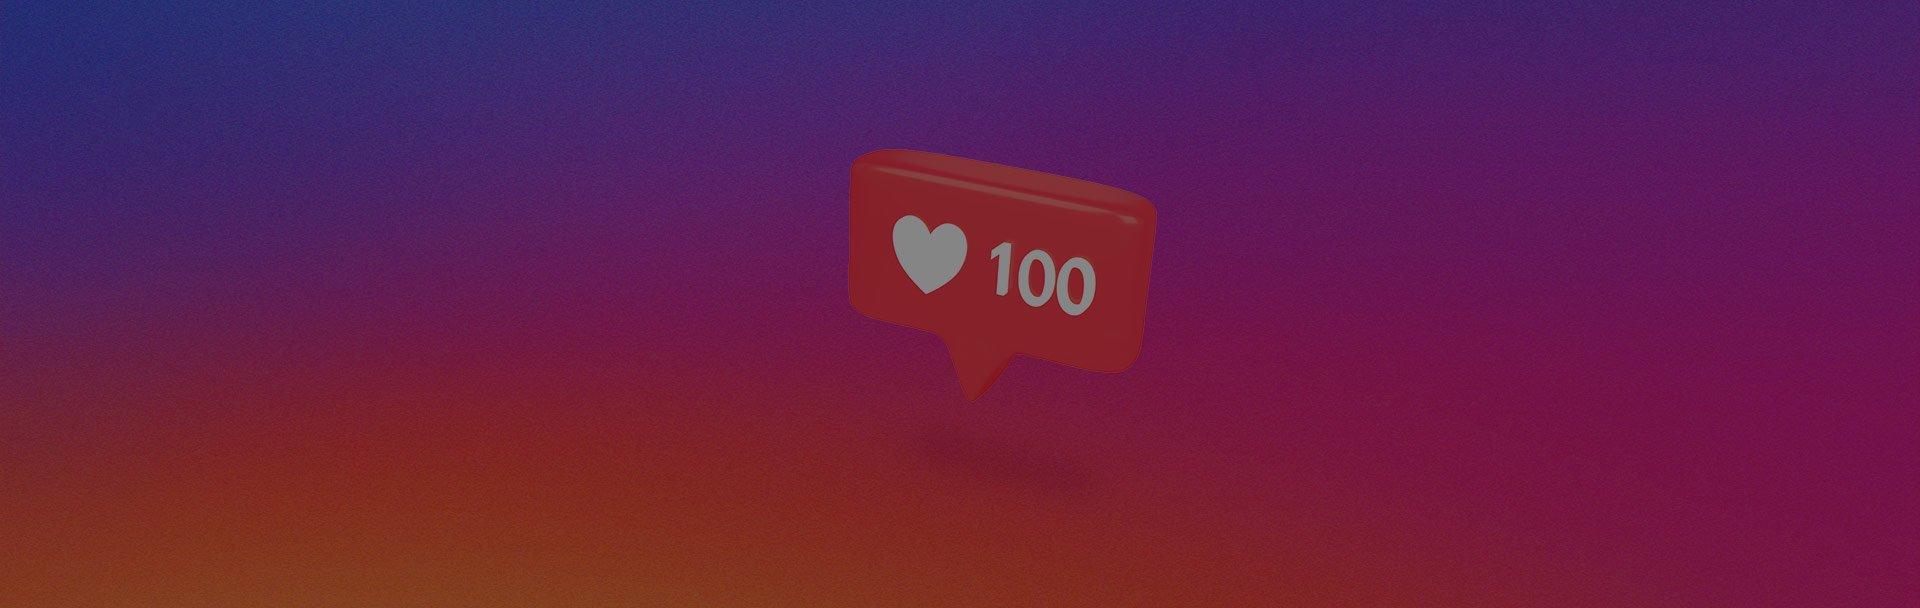 solucionweb-banner-blog-estrategia-digital-inbound-redes-sociales-blog-Instagram-para-tu-empresa.jpg